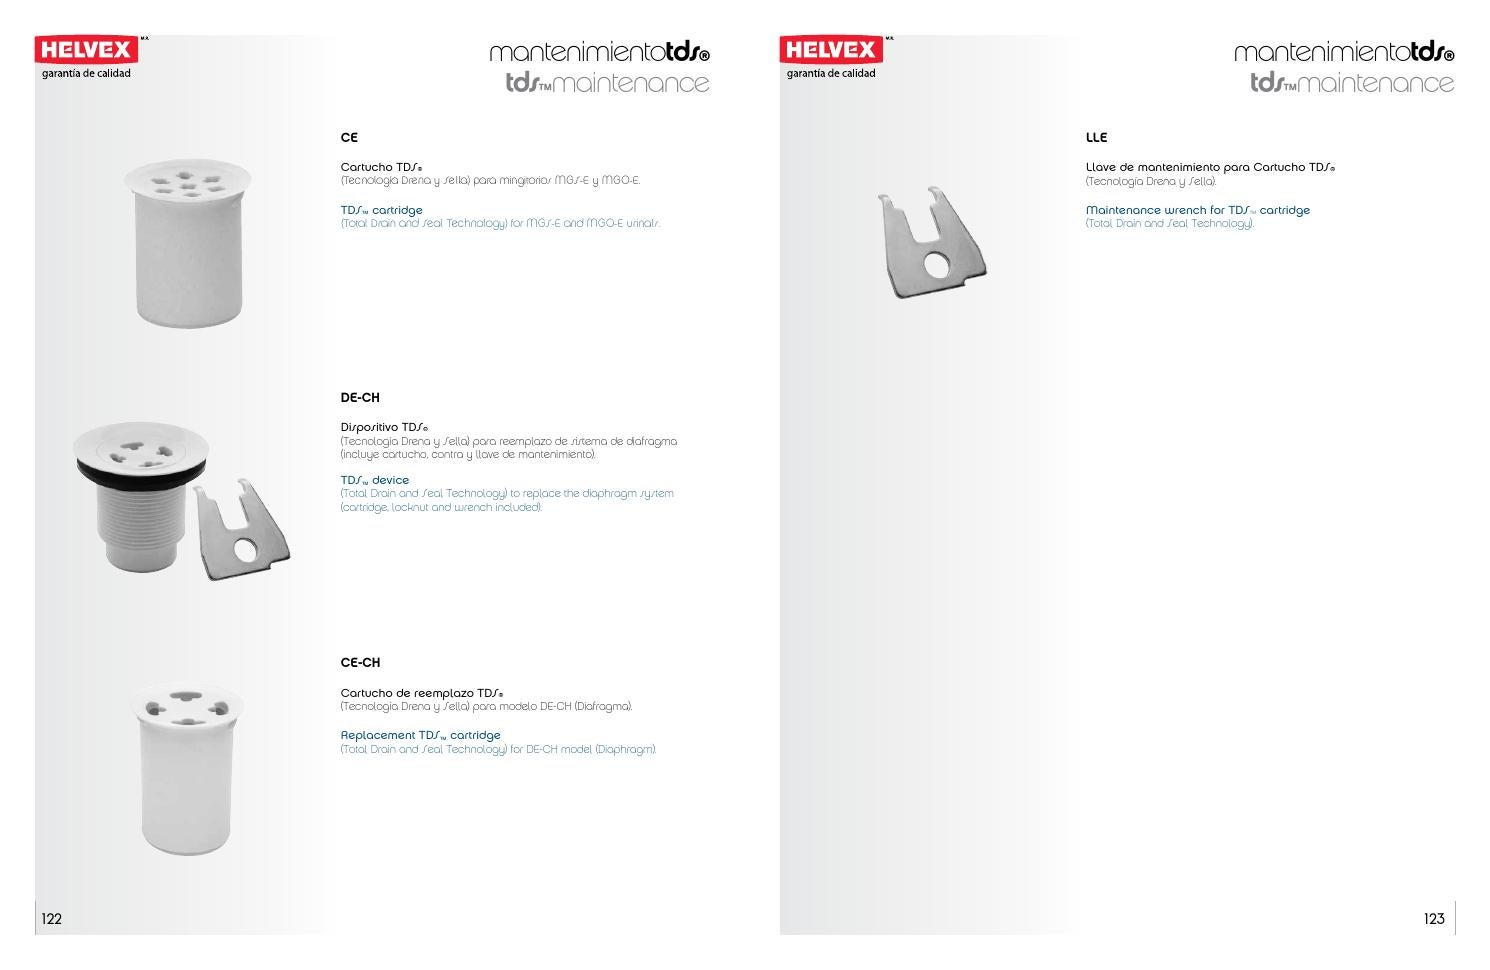 Manual Helvex Epub Download